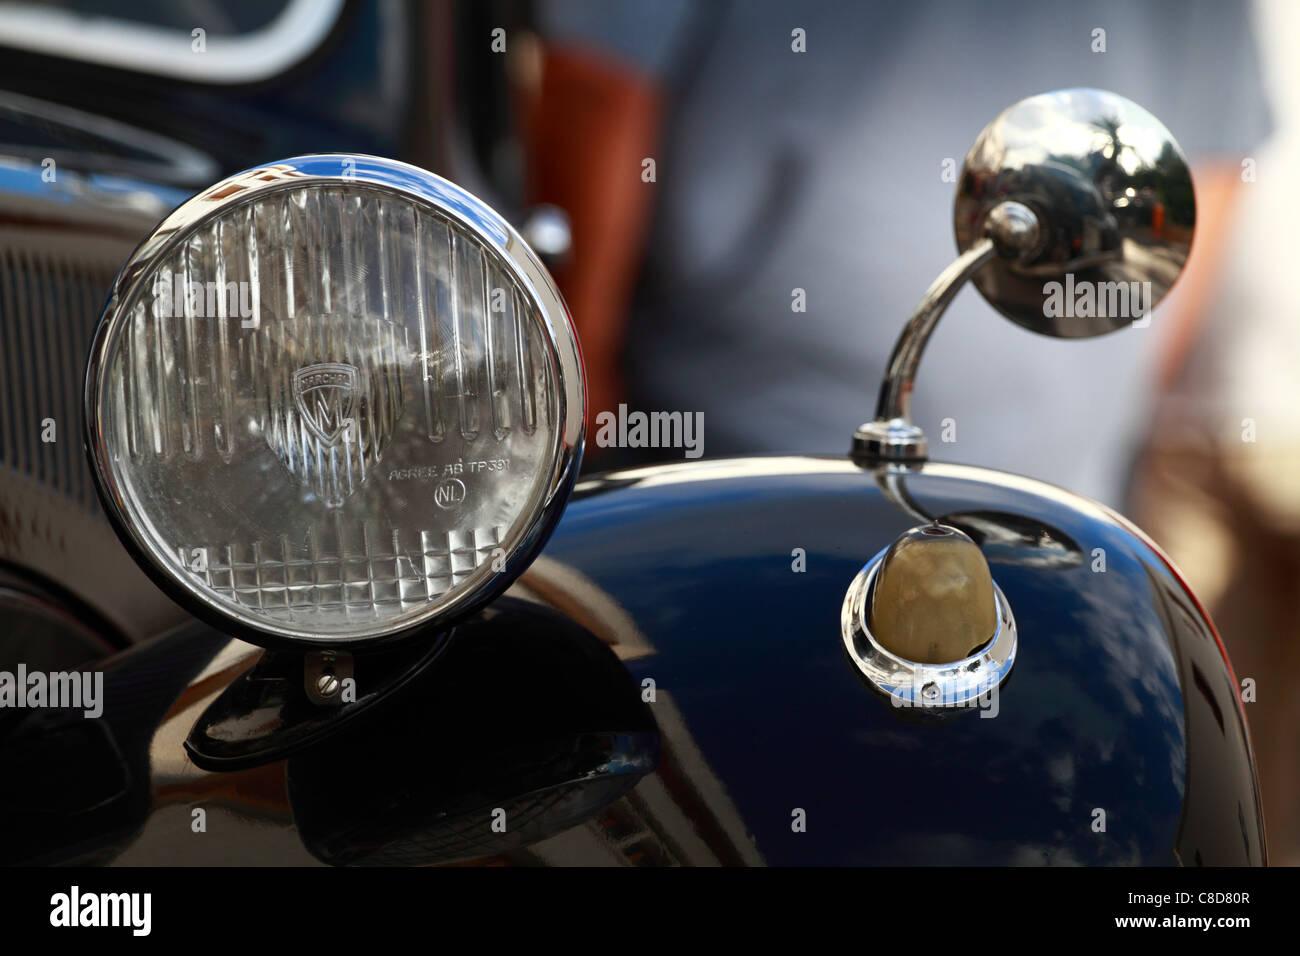 Vintage Citroen, front detail - Stock Image